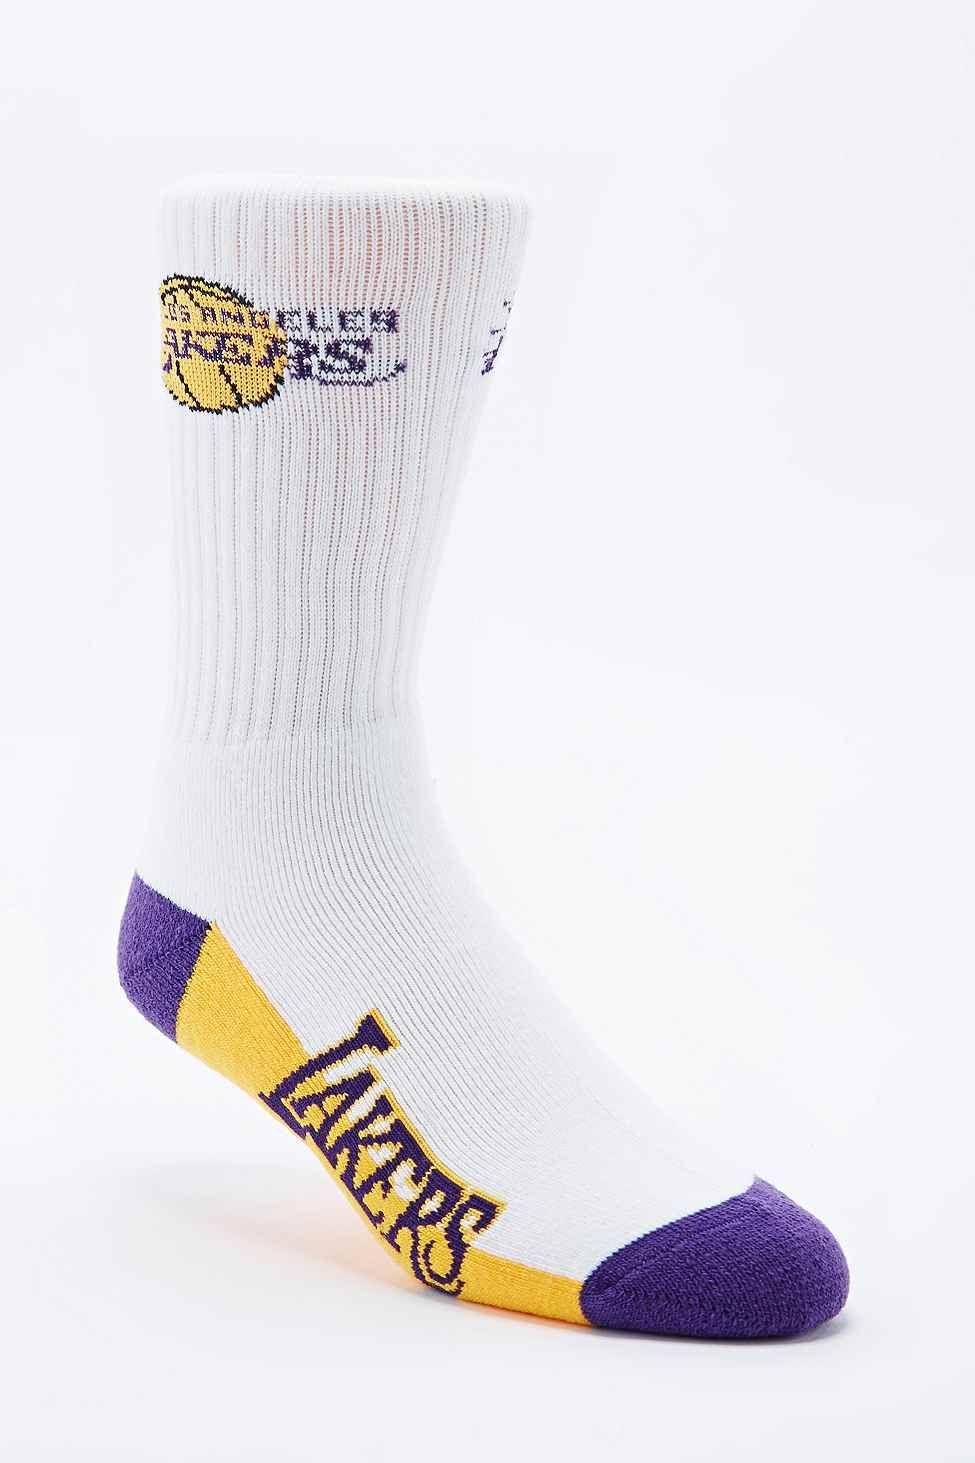 NBA LA Lakers Team Socks - Urban Outfitters b89e66a78